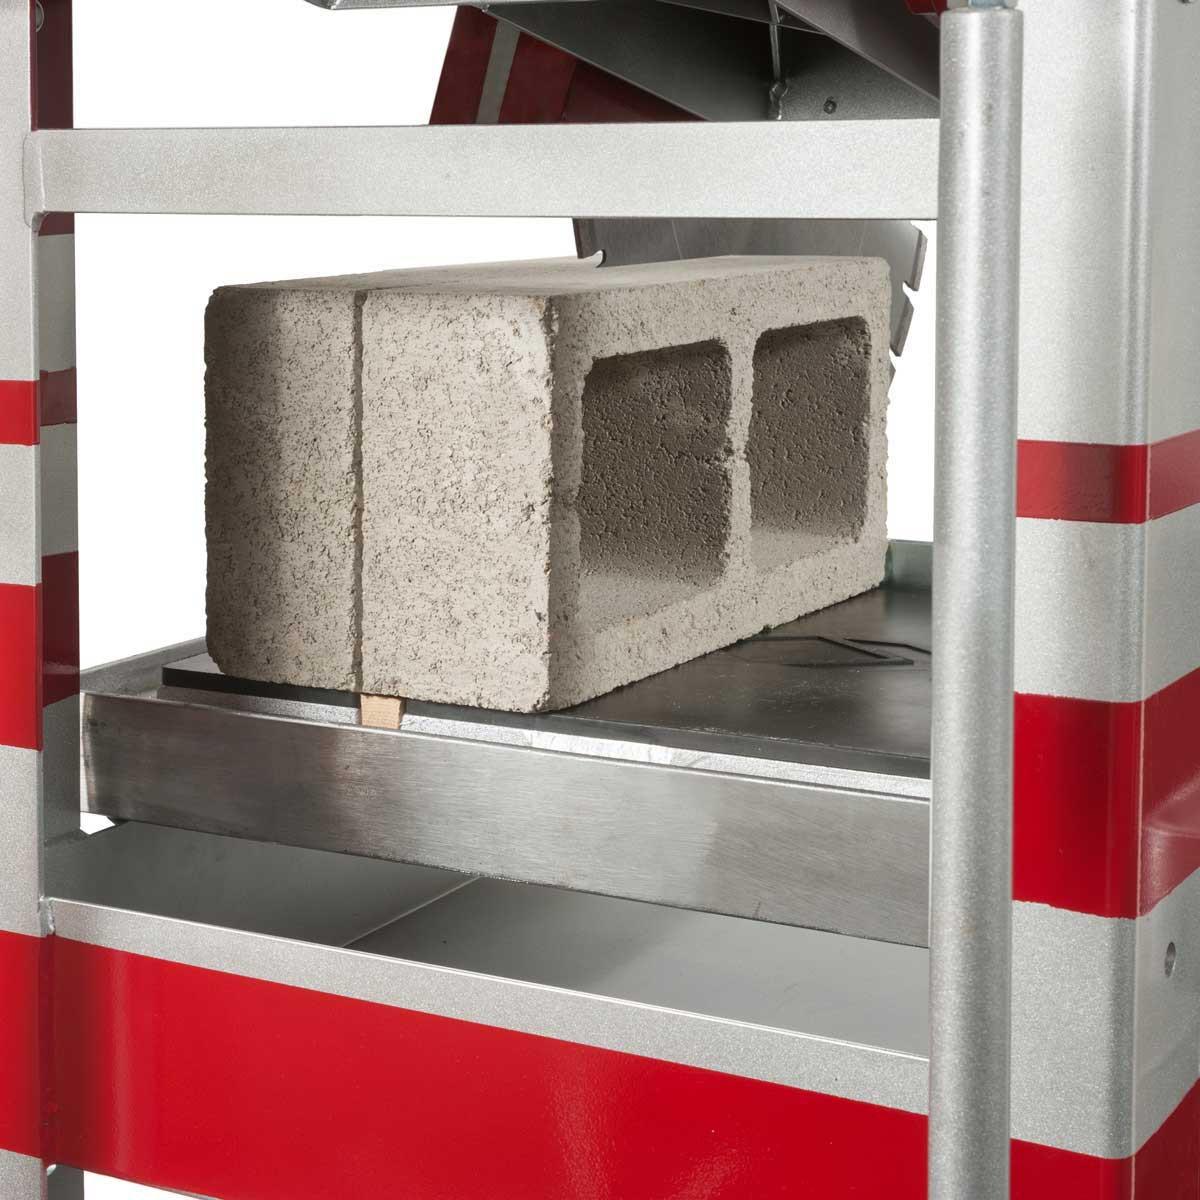 MK MX-5 Block Saw Cutting Cinder Block